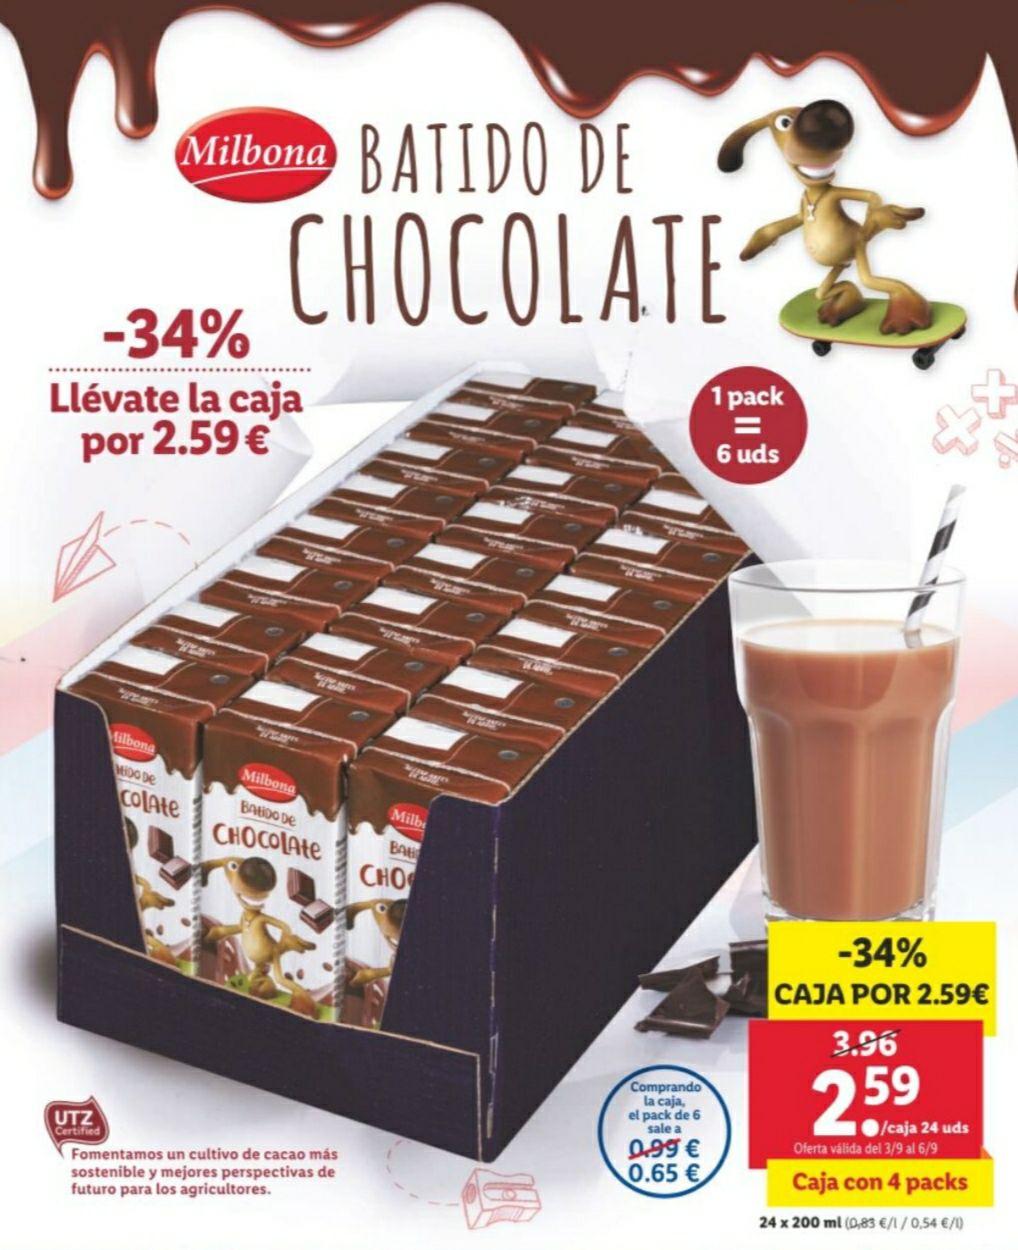 Batido de chocolate 24x200ml LIDL